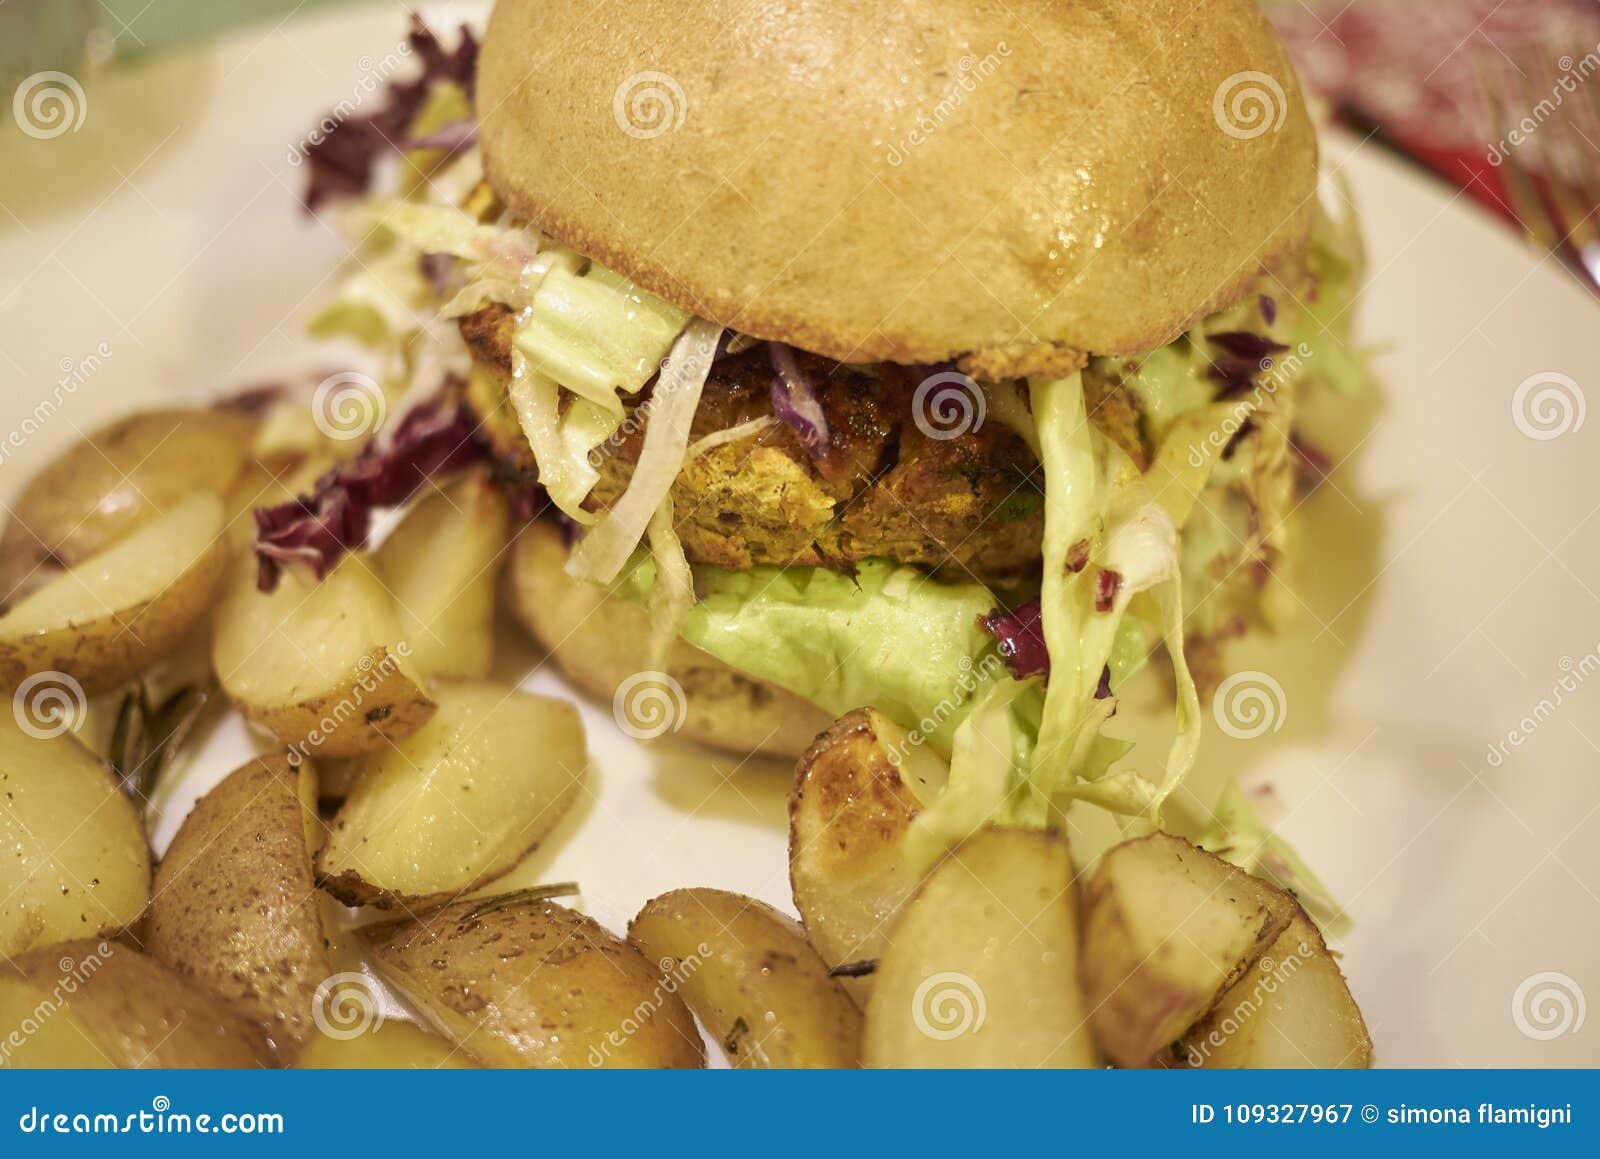 Hamburguesa vegetariana con las patatas asadas